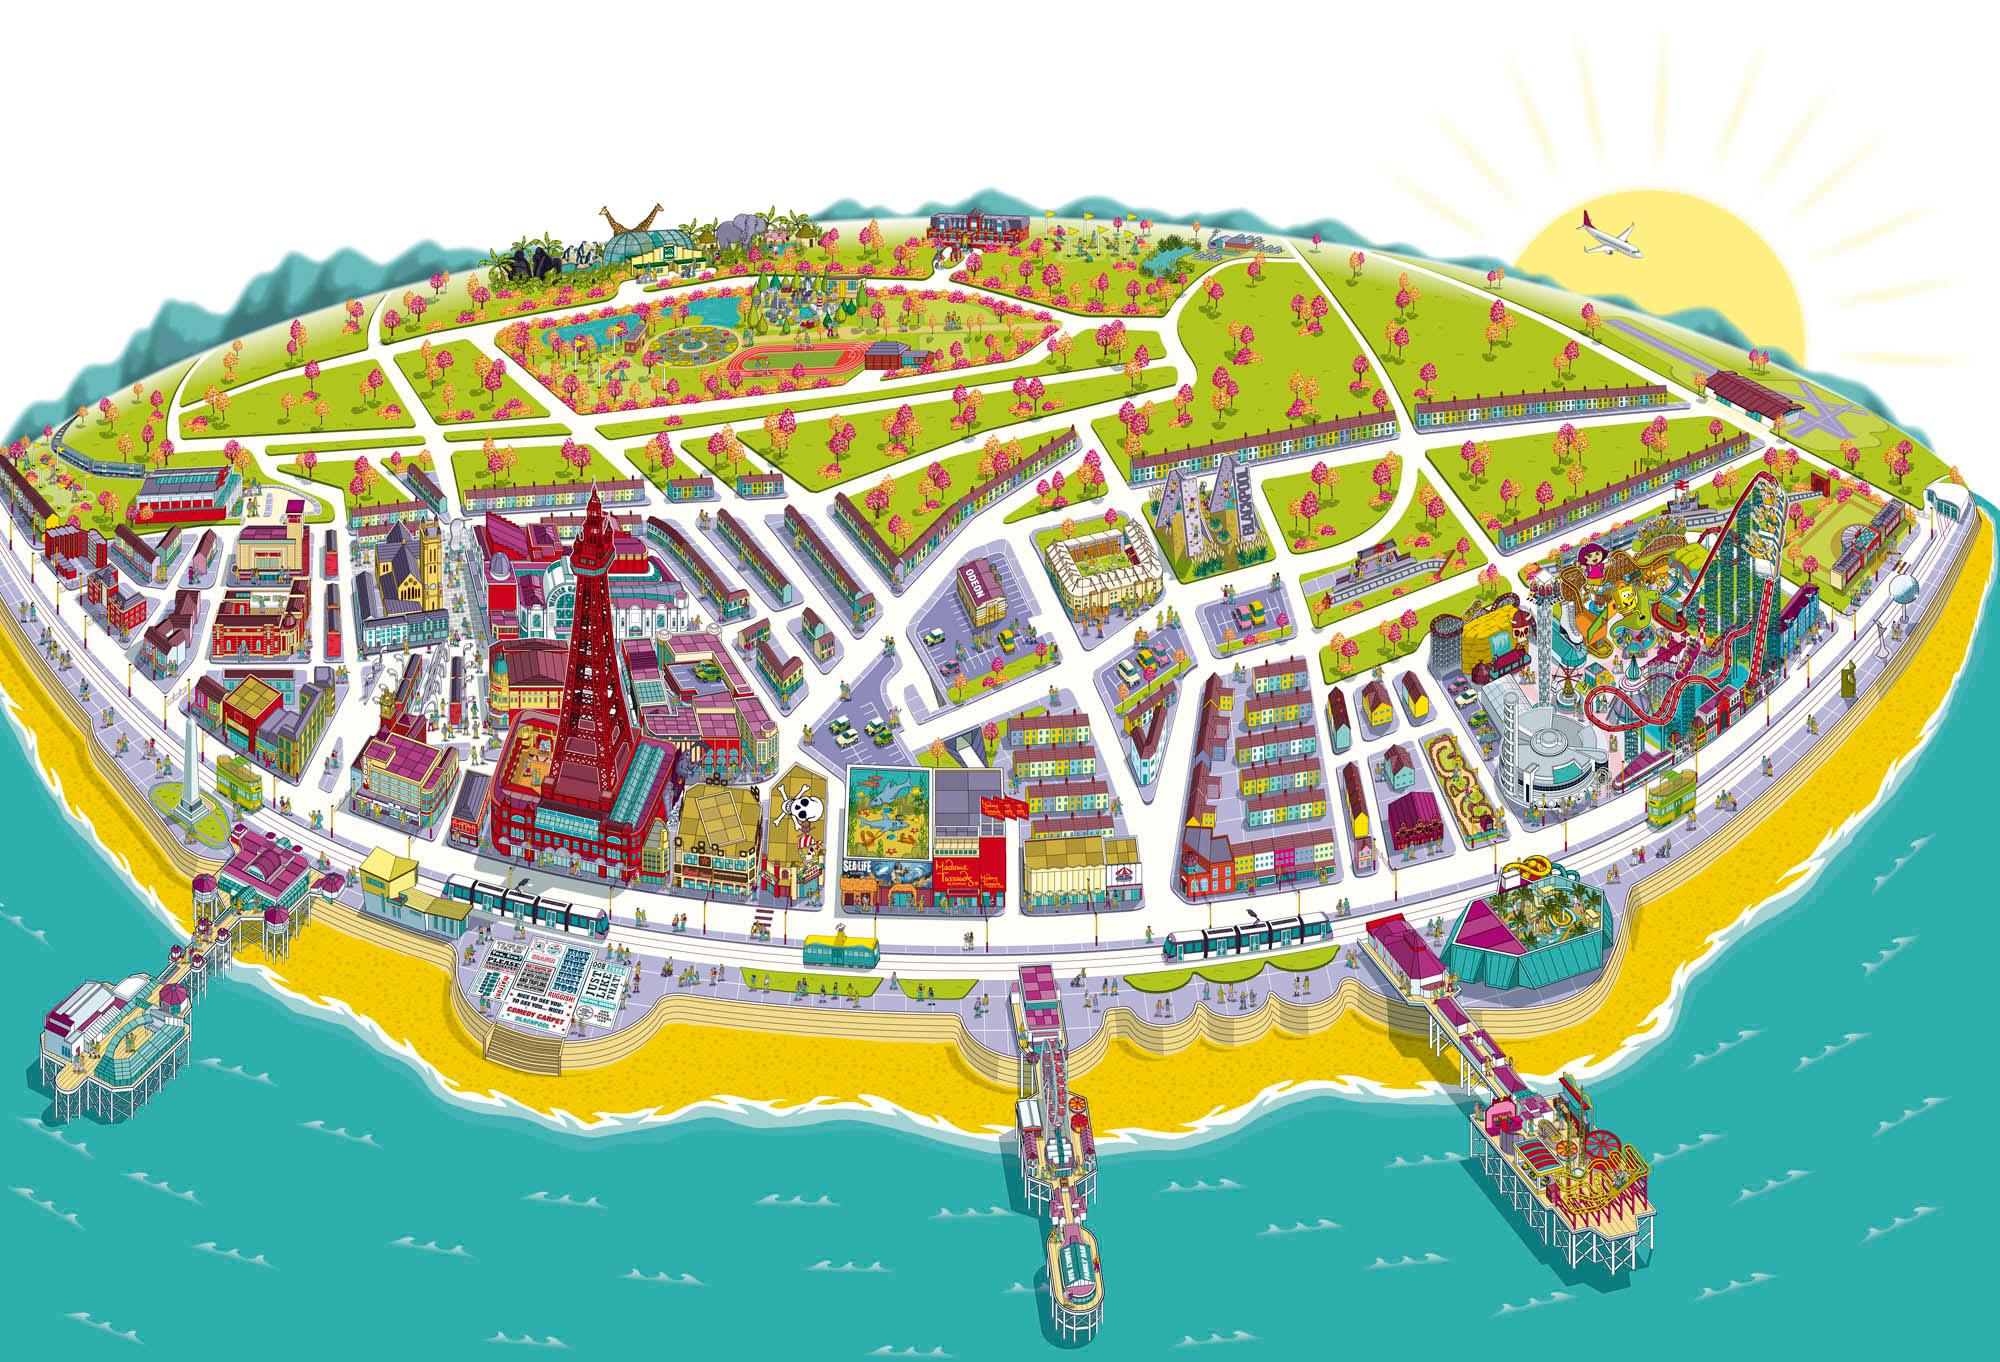 Resort Map Illustration for Visit Blackpool on Behance